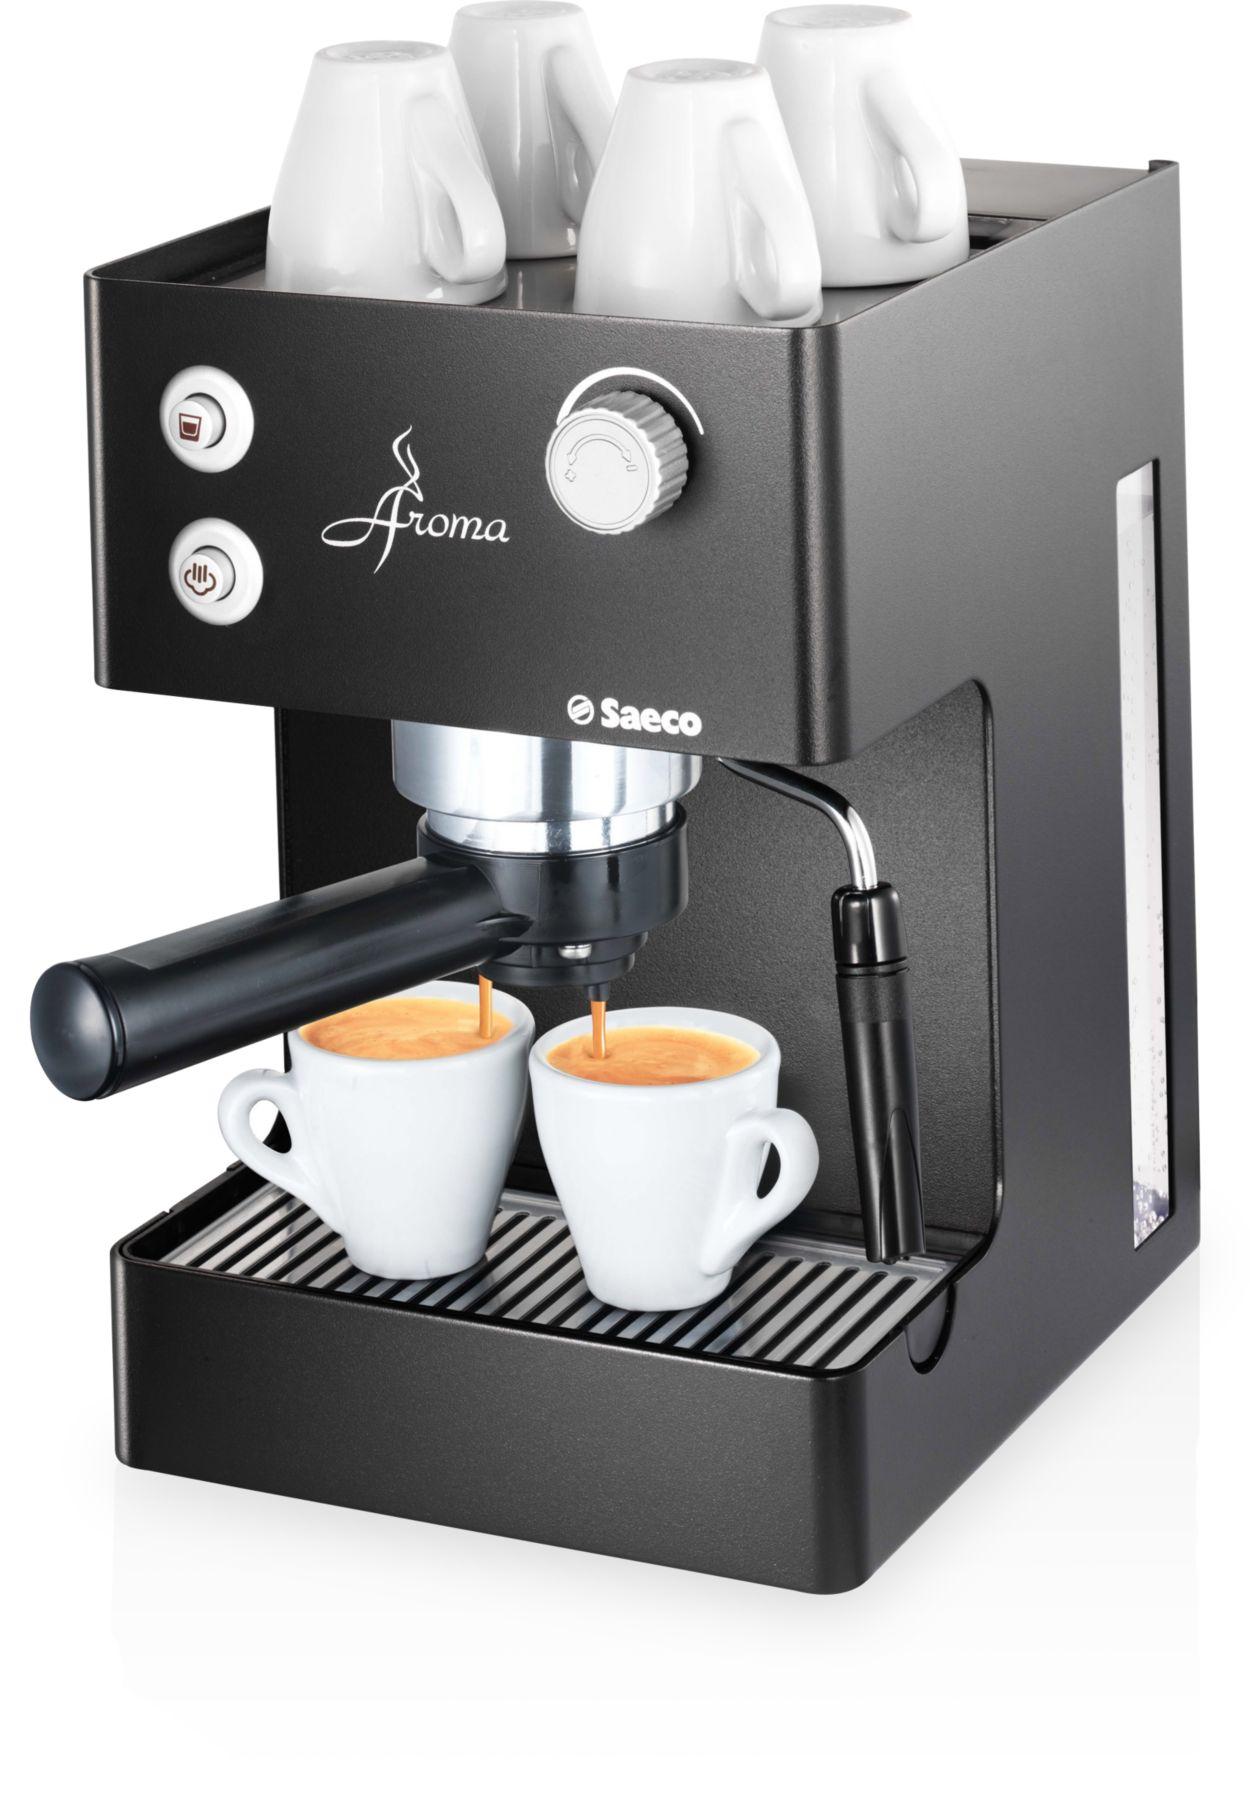 Electronic Saeco Coffee Machine Manual aroma manual espresso machine ri937347 saeco taste the full of your espresso